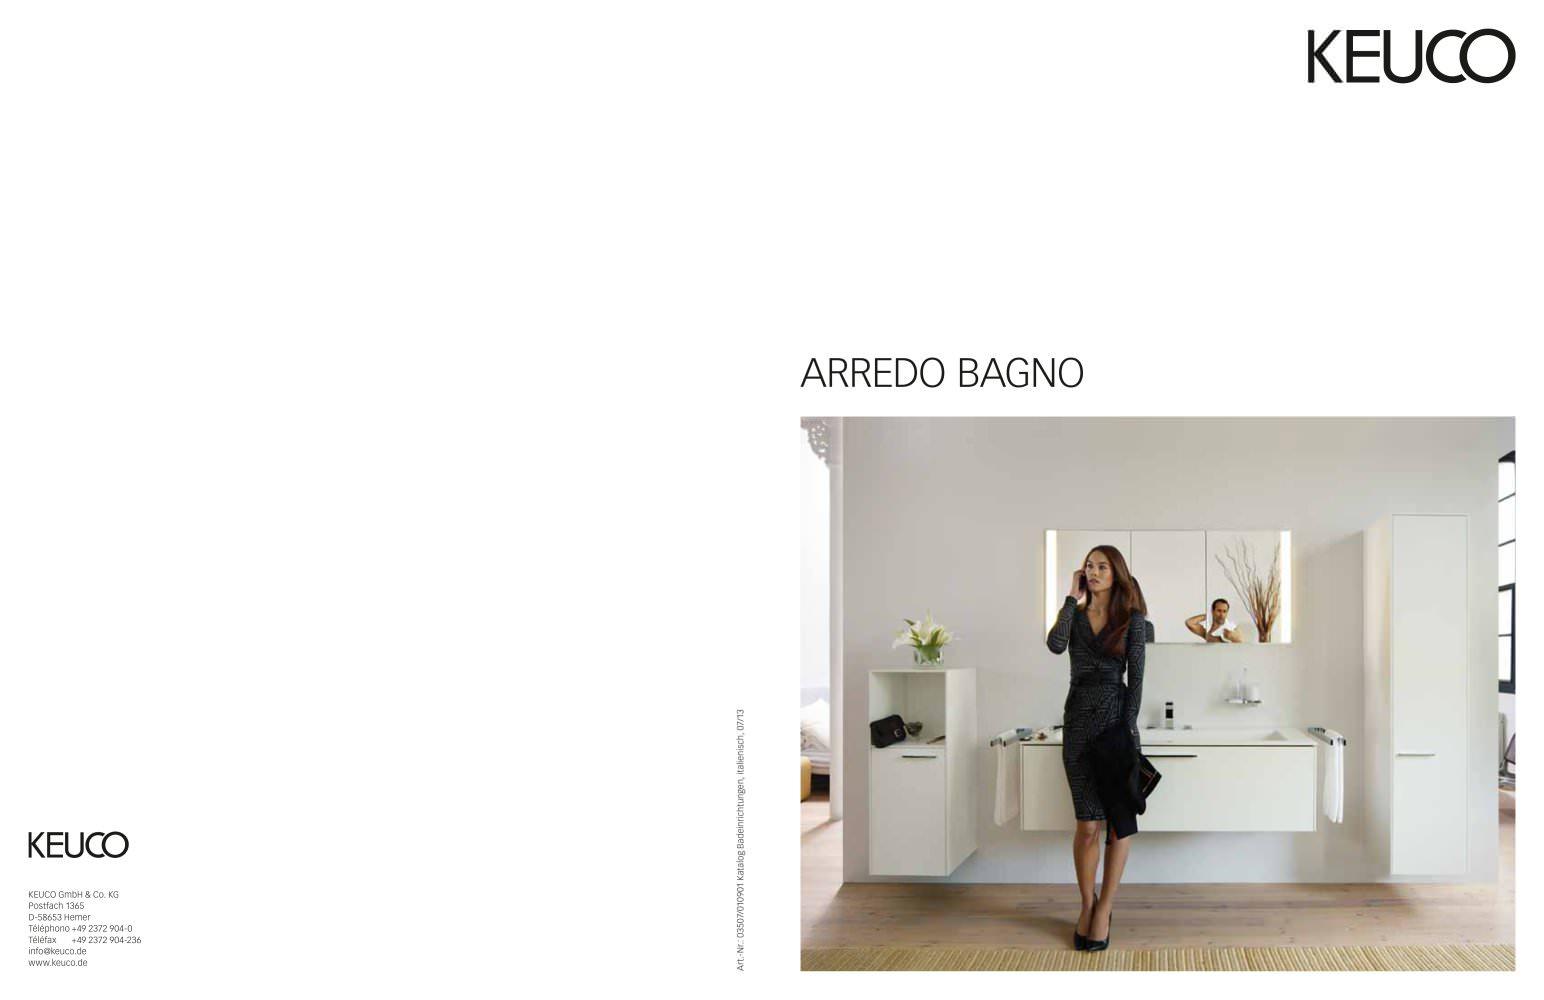 keuco arredo bagno - keuco - catalogo pdf | documentazione | brochure - Brand Arredo Bagno